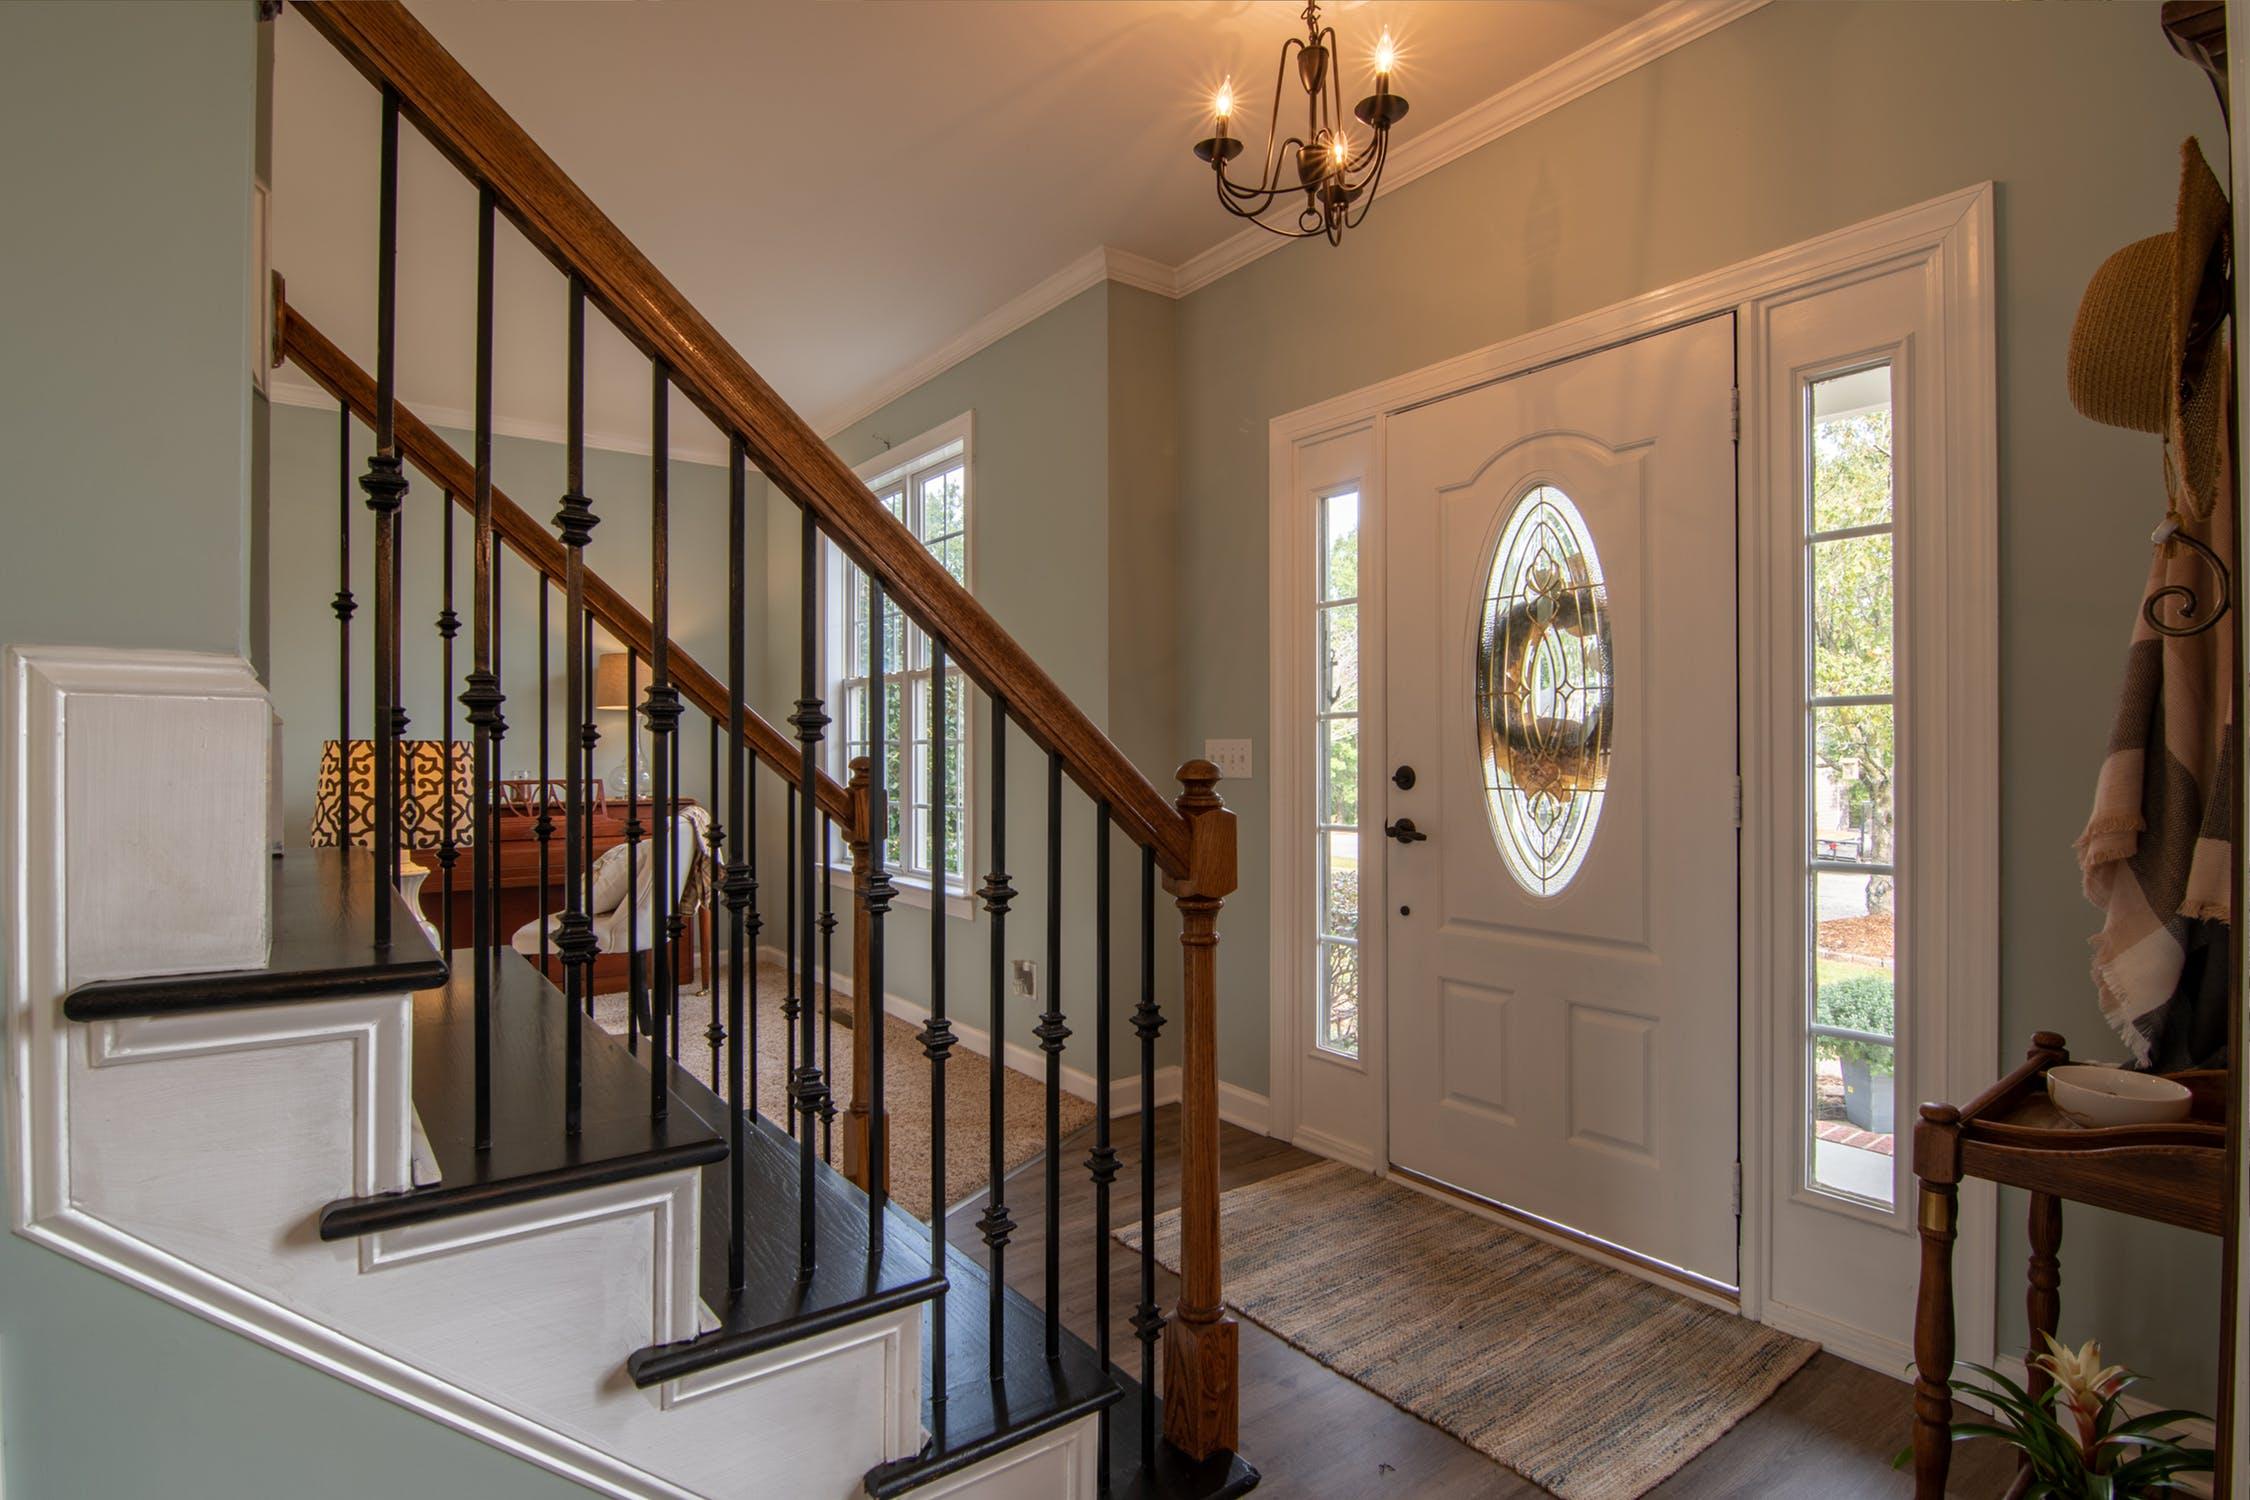 Edgarson Home Improvement LLC